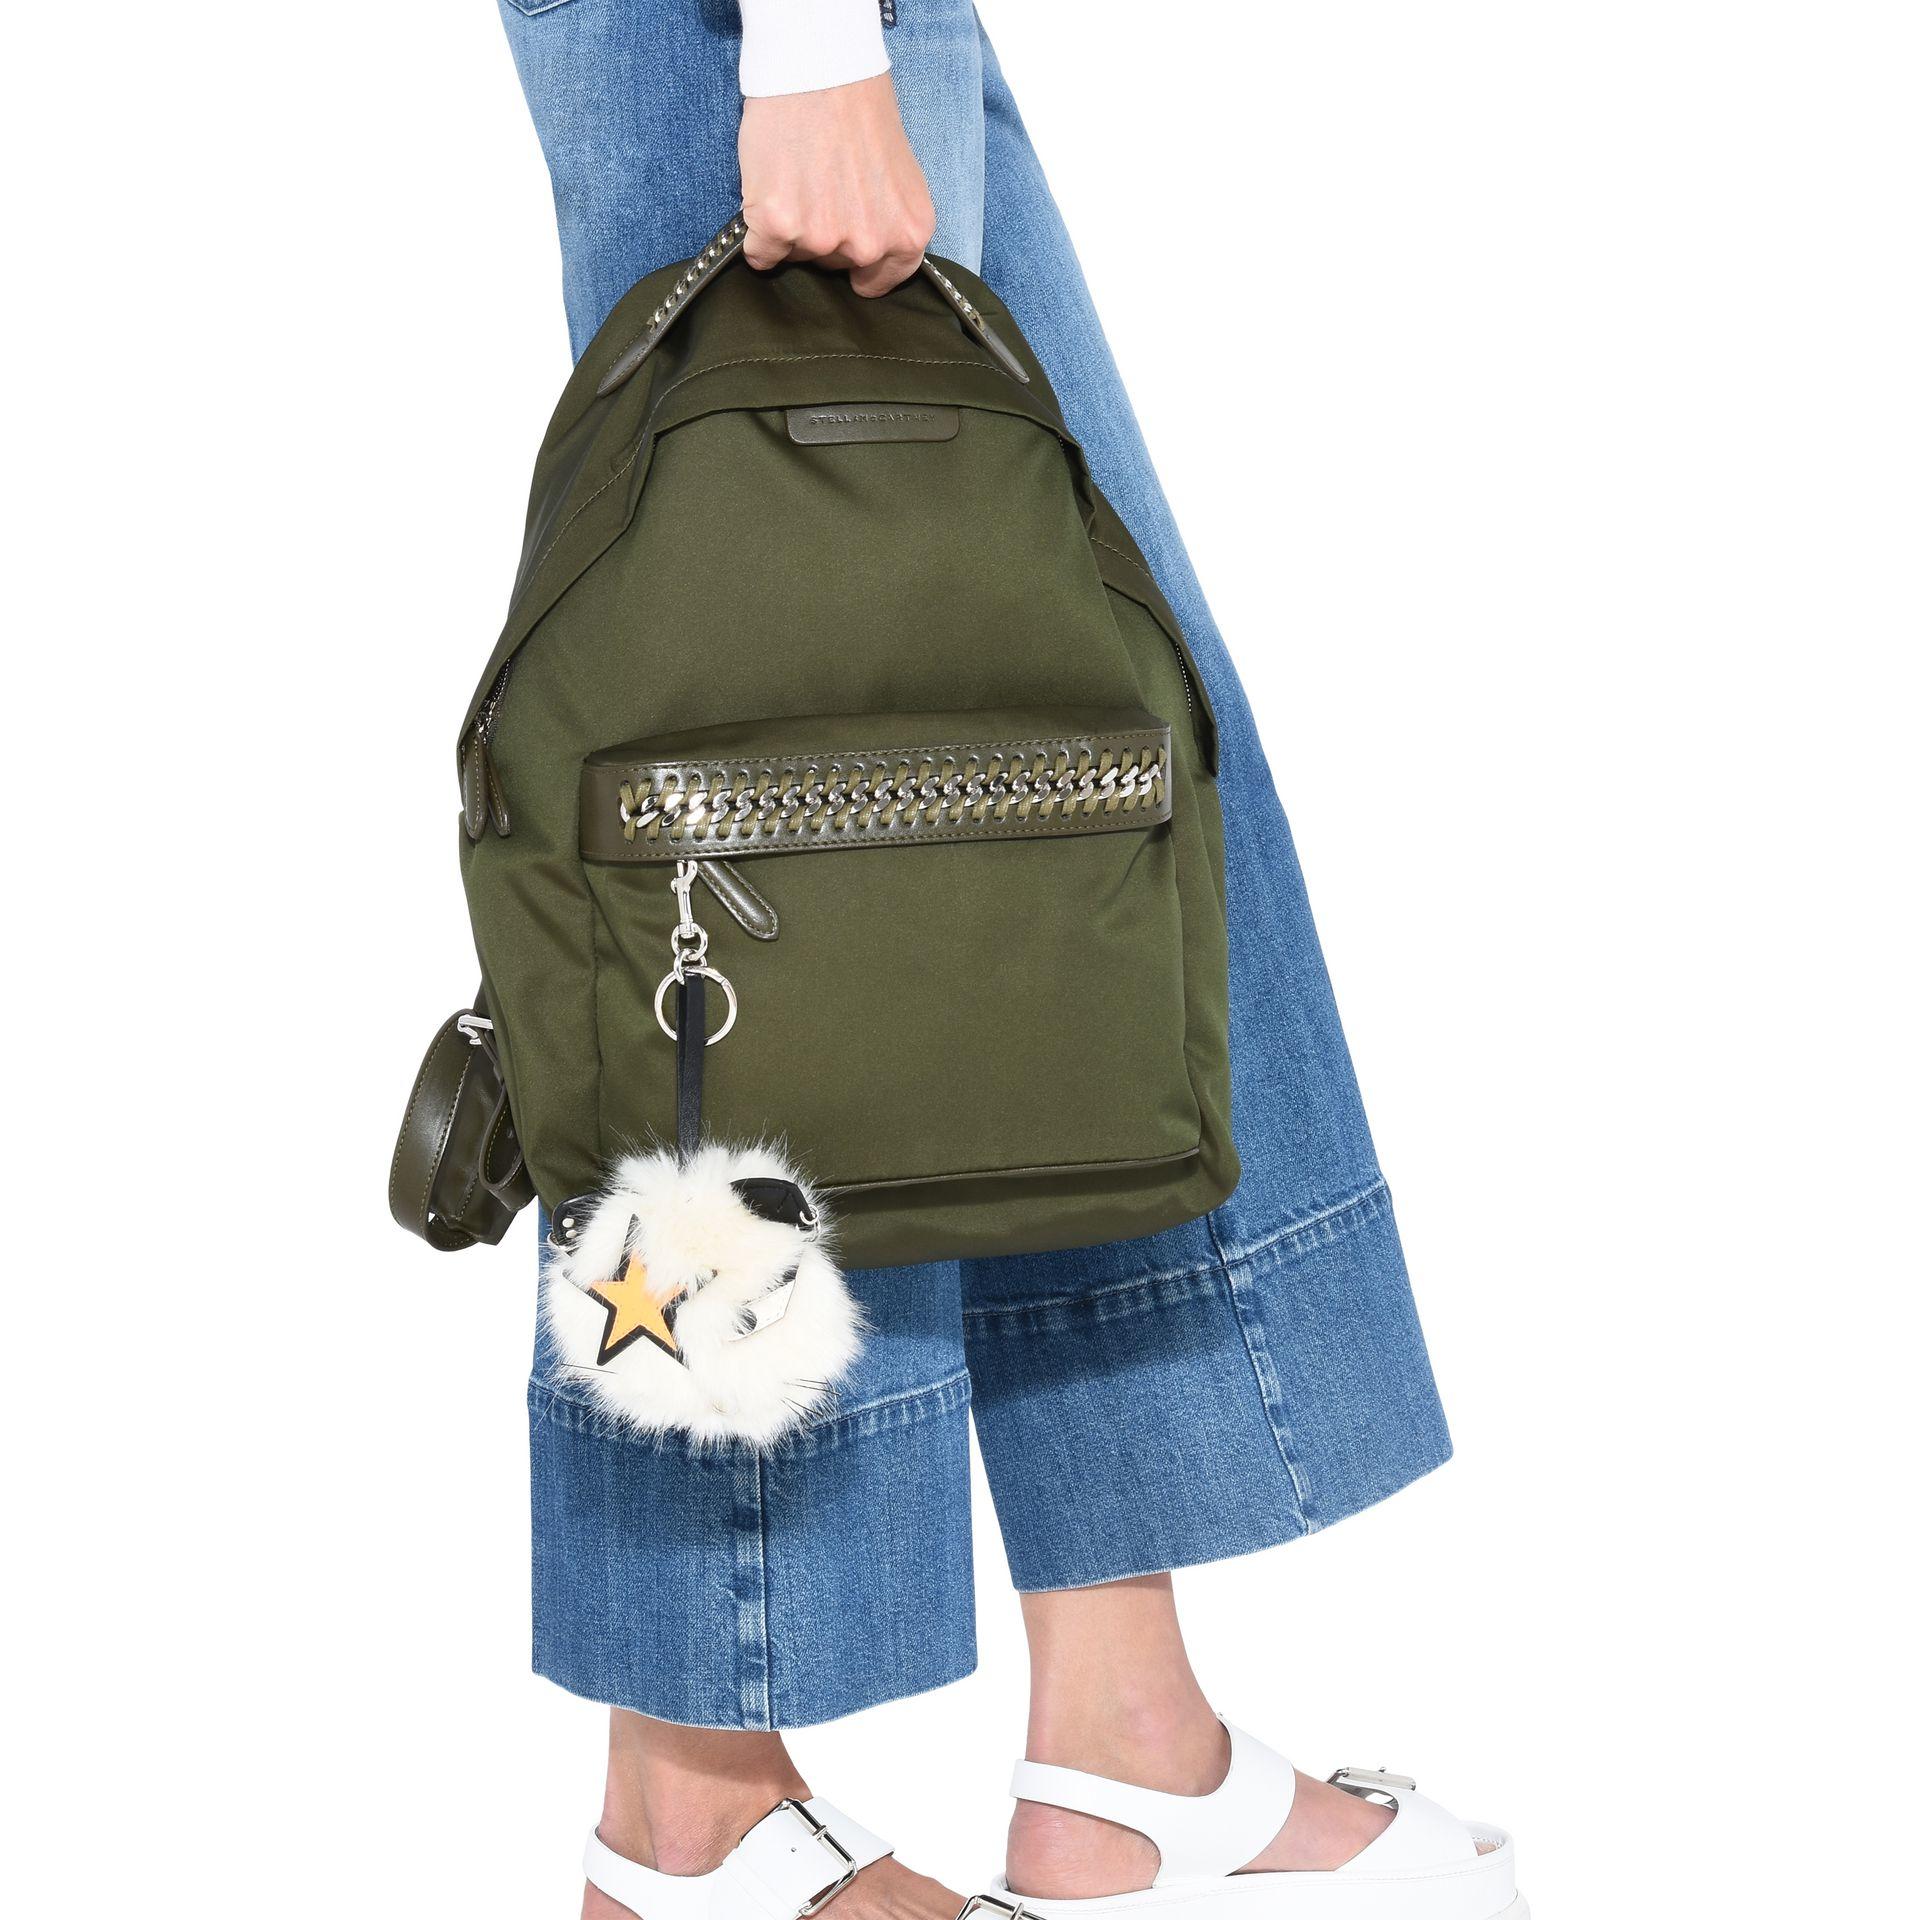 a6100e6e9d49 Stella McCartney Khaki Falabella Go Backpack in Green - Lyst